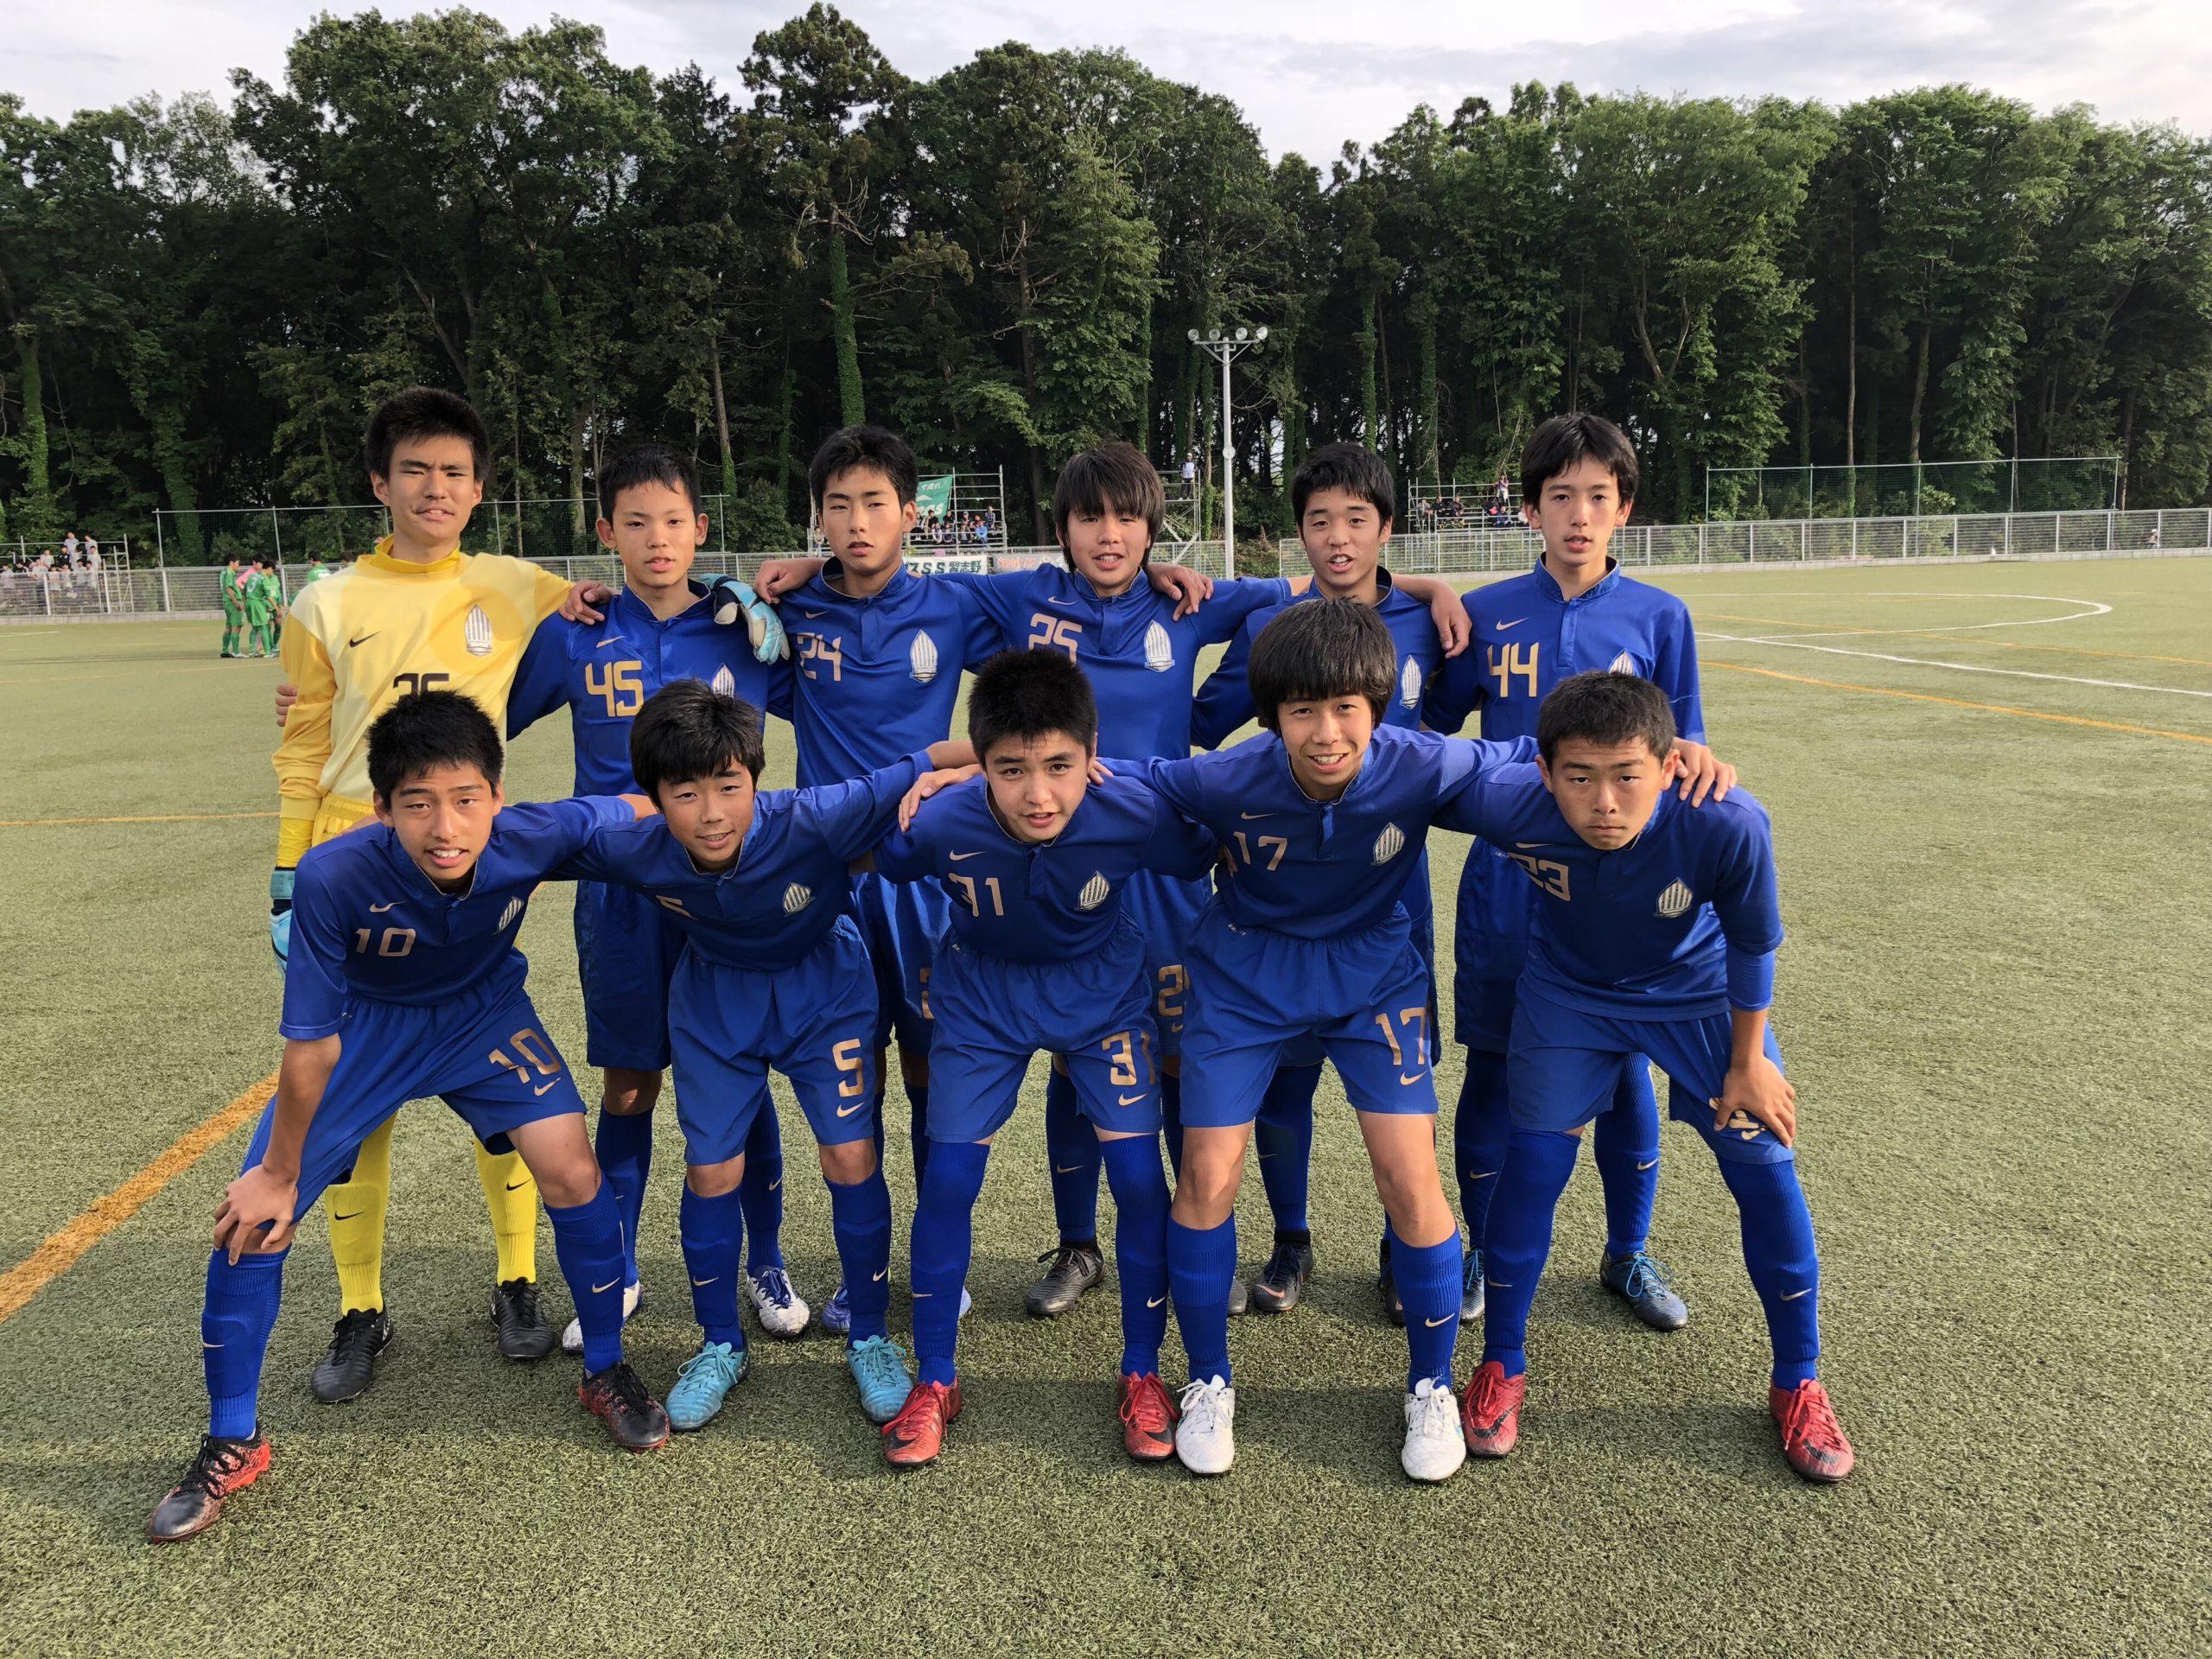 【U15】日本クラブユース(U-15)サッカー選手権大会 千葉県大会